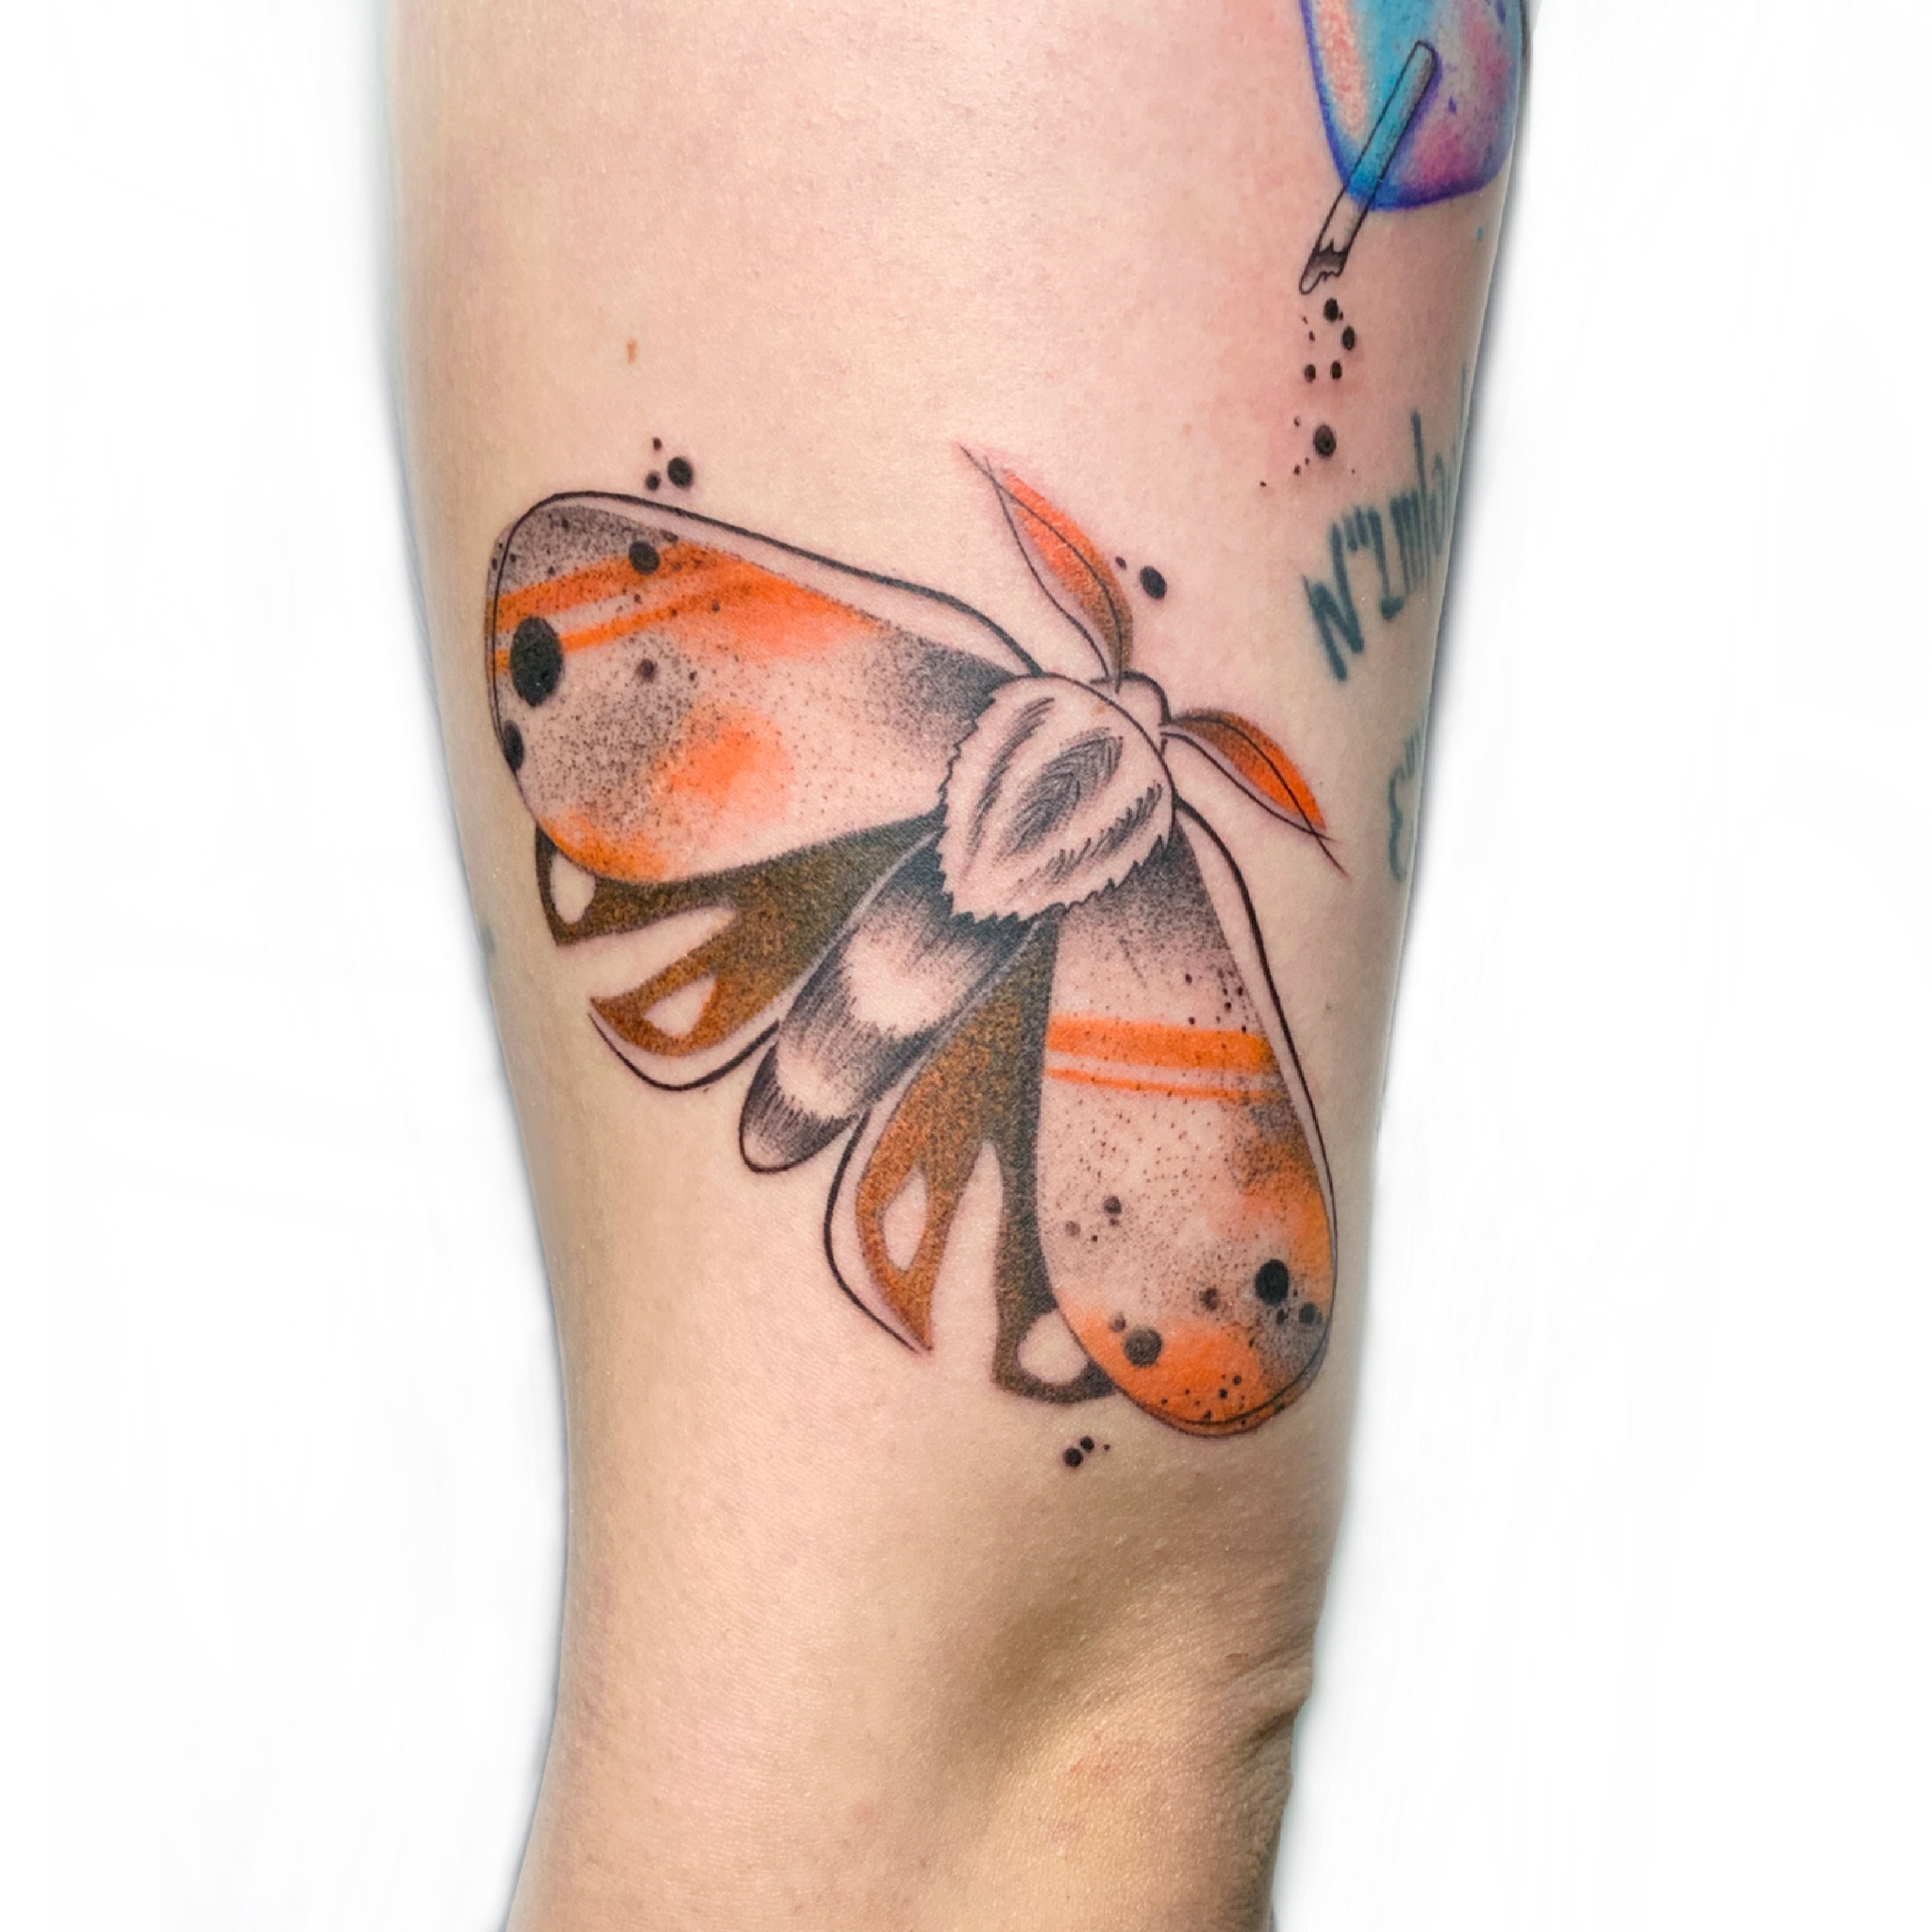 Inksearch tattoo Yuna